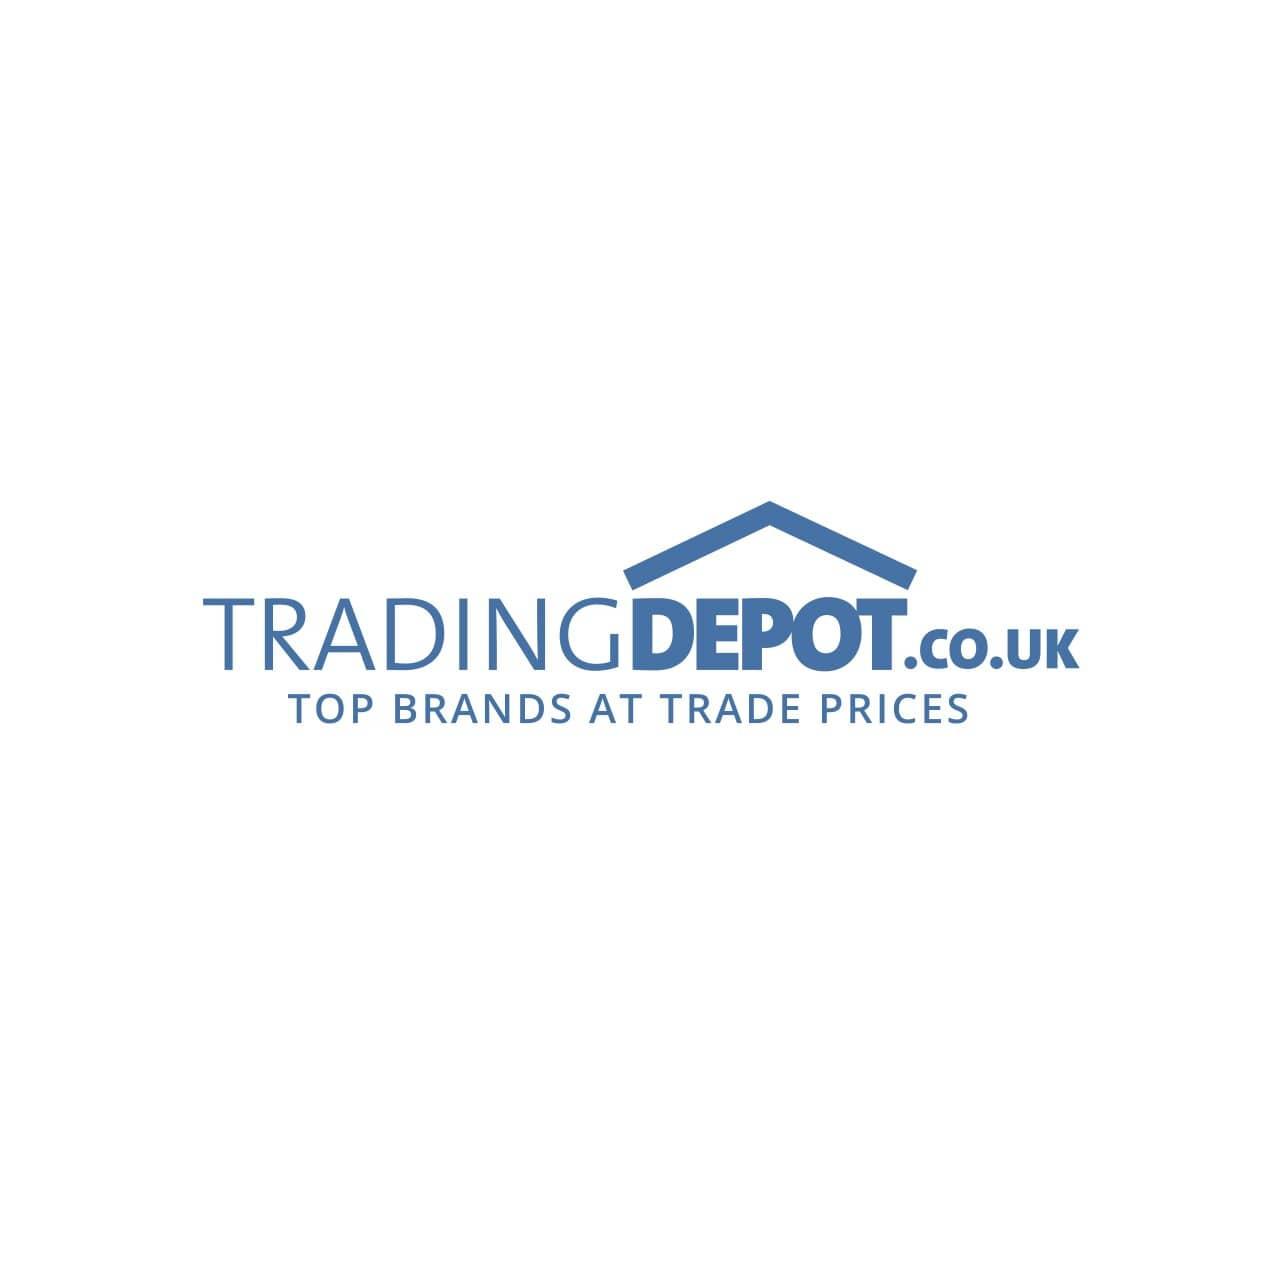 Velux Centre Pivot Roof Window with Obsure Laminated Inner & Toughened Outer Pane Glazing – White Polyurethane 134 x 98cm - GGU UK04 0034